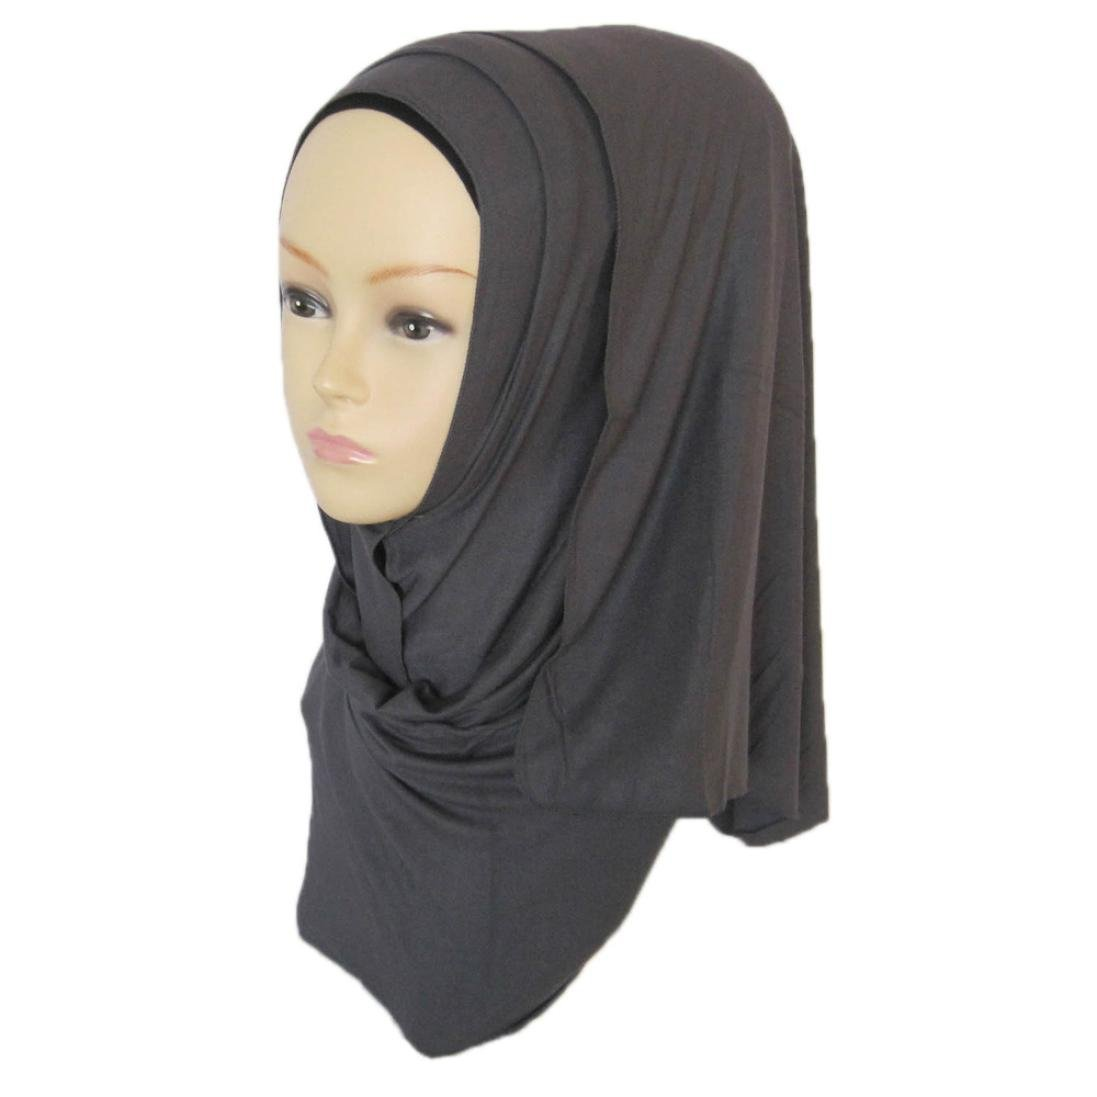 DZT1968 Women daily Cotton Sweat Long Scarf Muslim Hijab Arab Wrap Shawl Headwear (Gray)